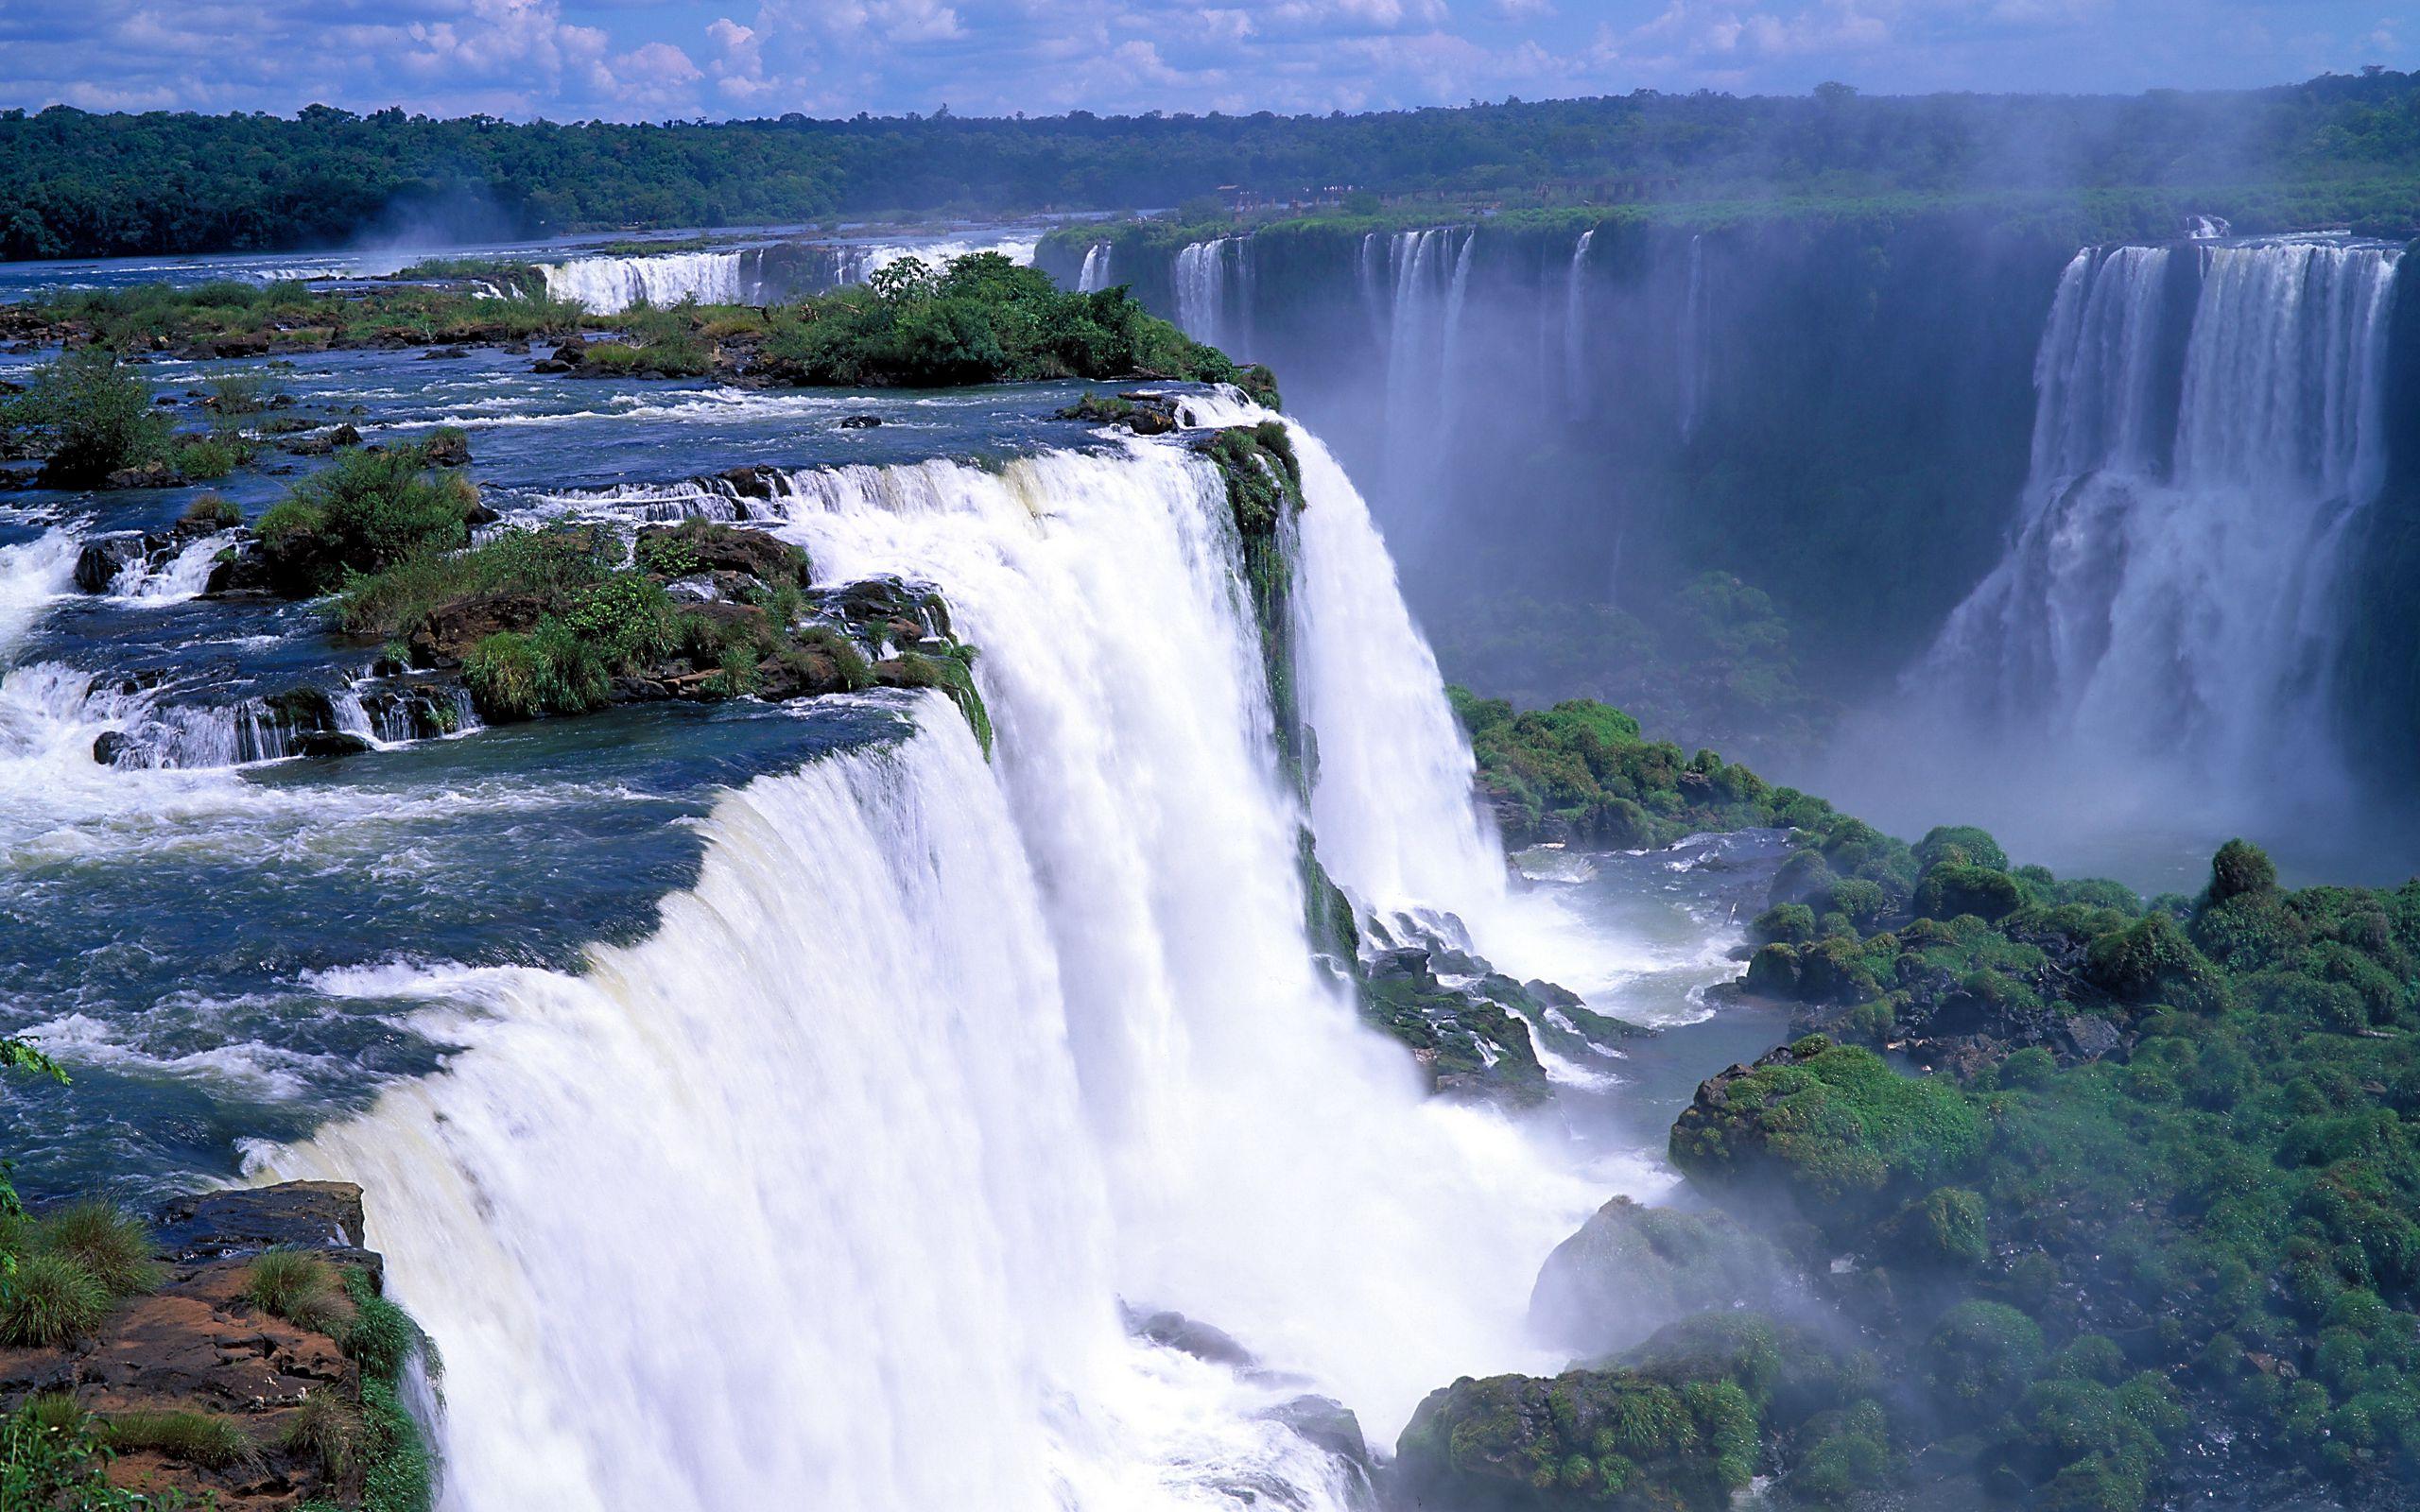 2560x1600 Wallpaper falls, rocks, trees, steam, stream, force, power